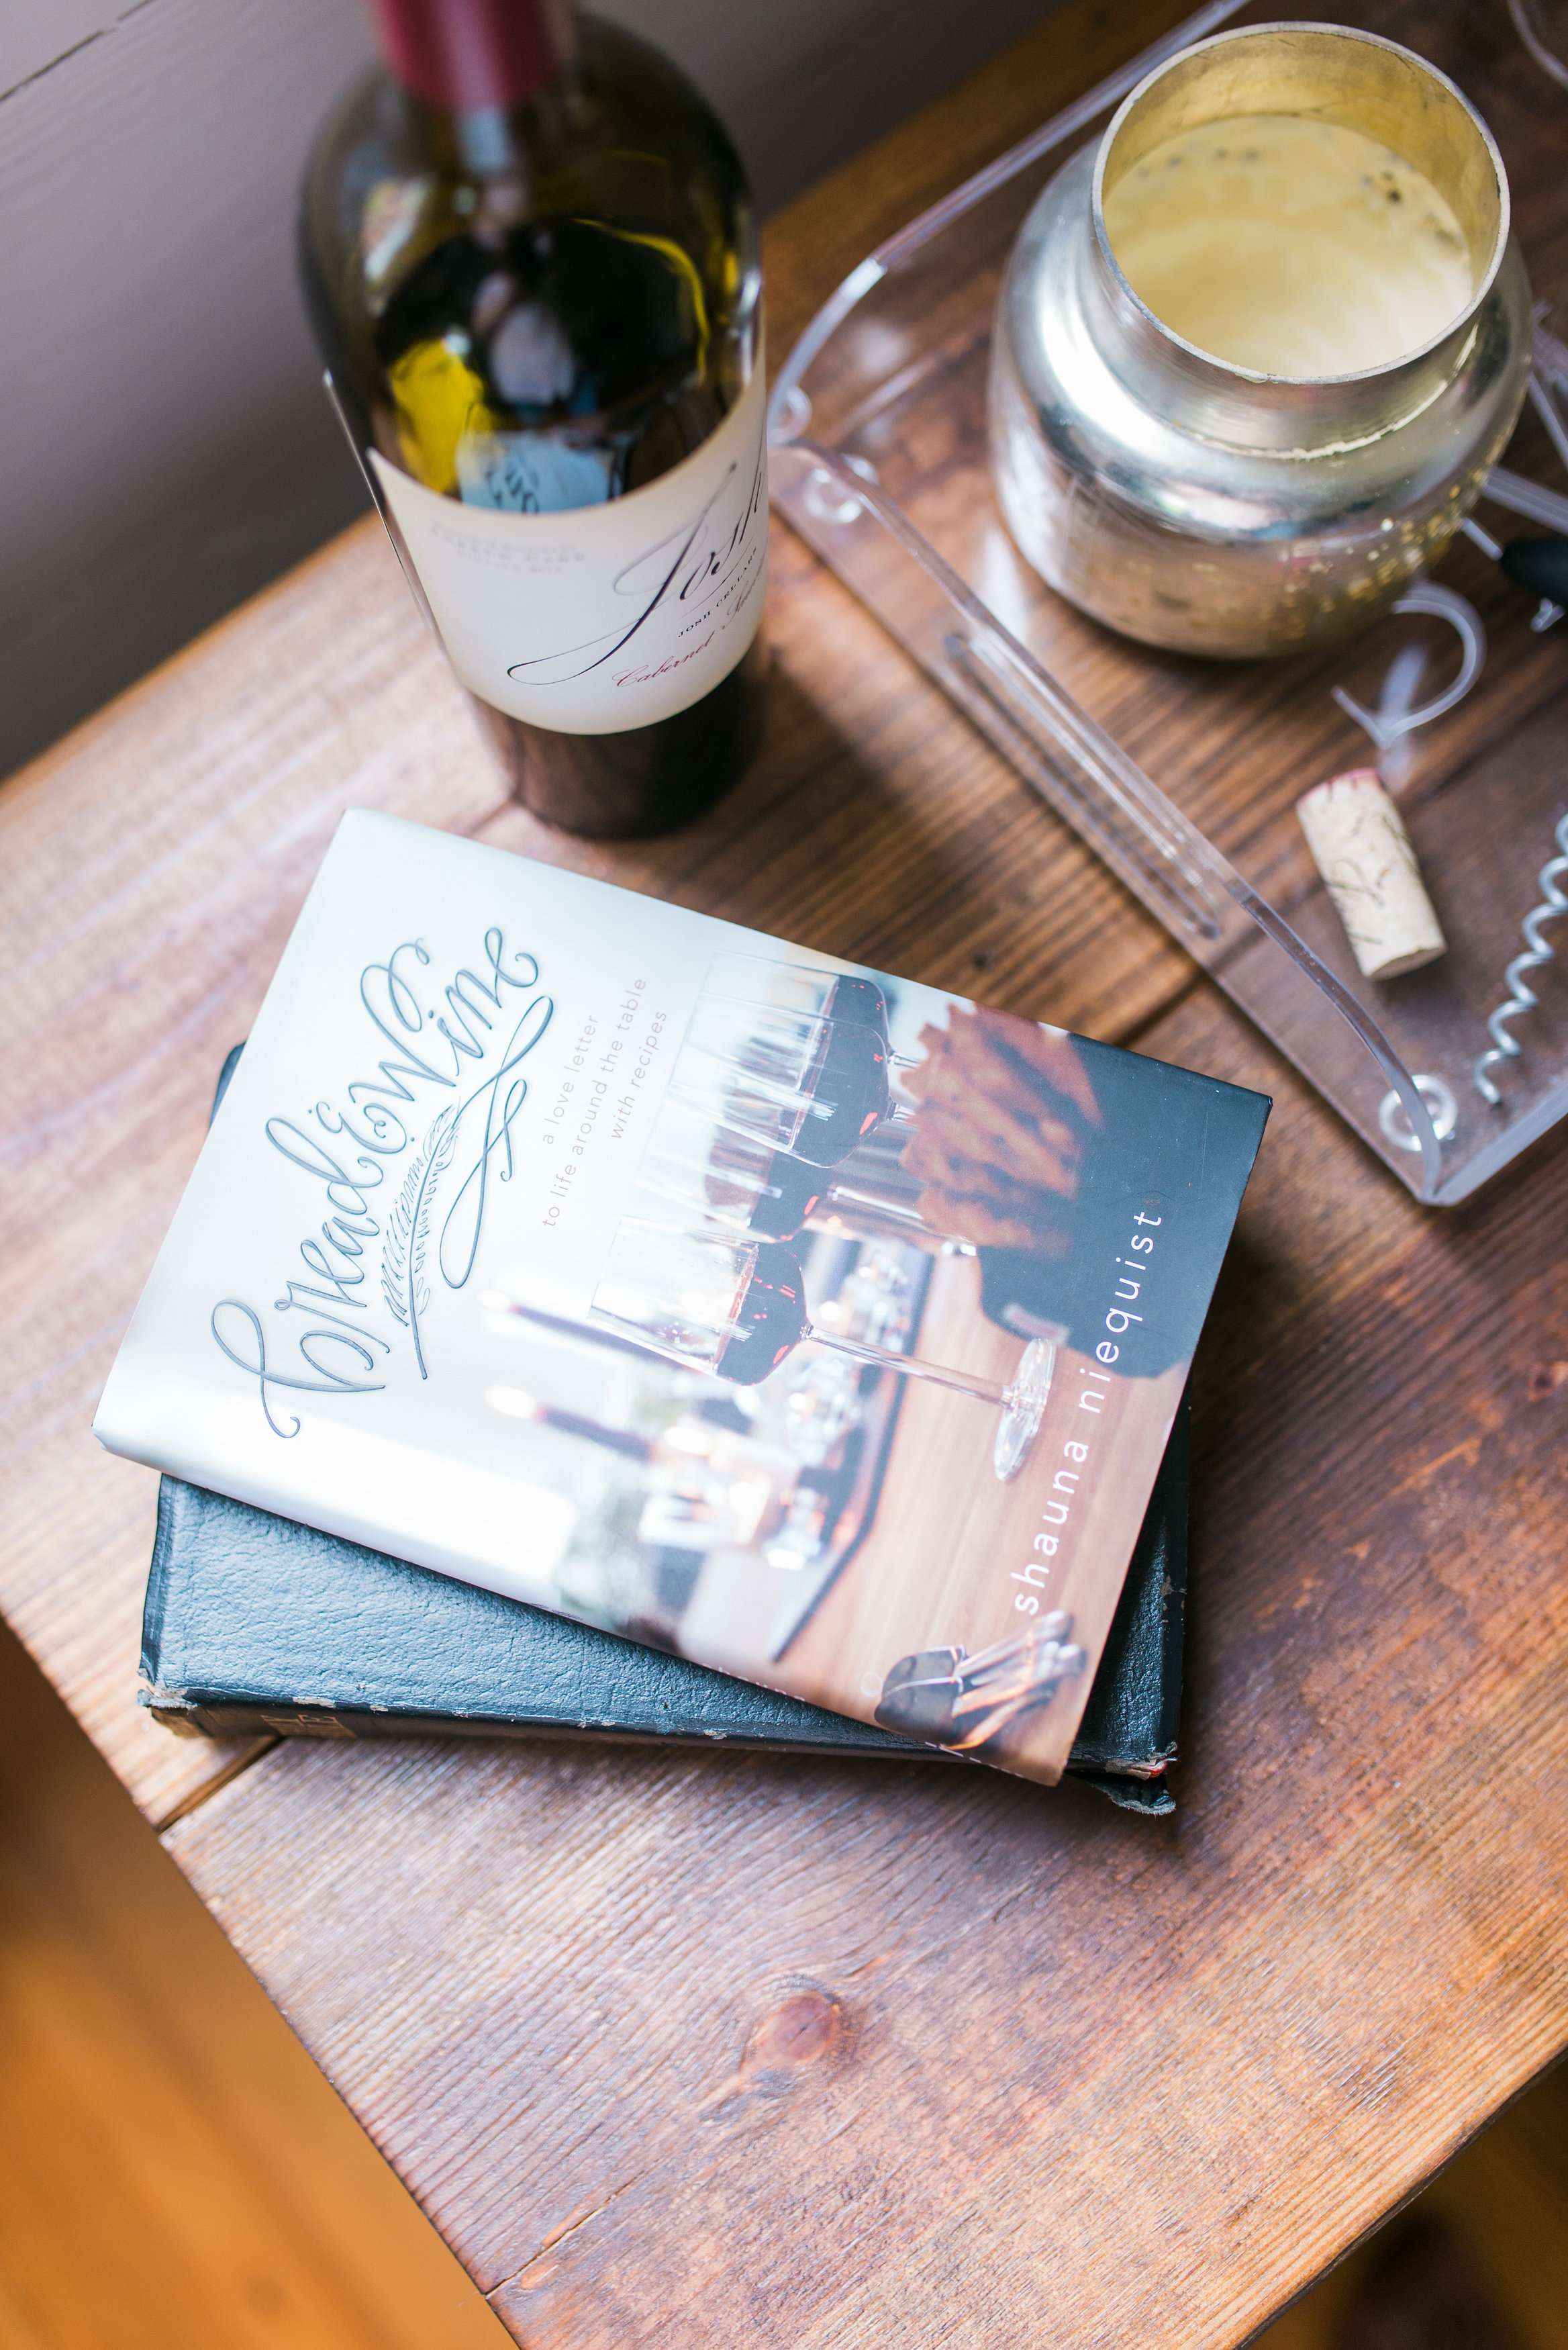 CottageHillSimpleHome_LaurenJollyPhotography-3245.jpg